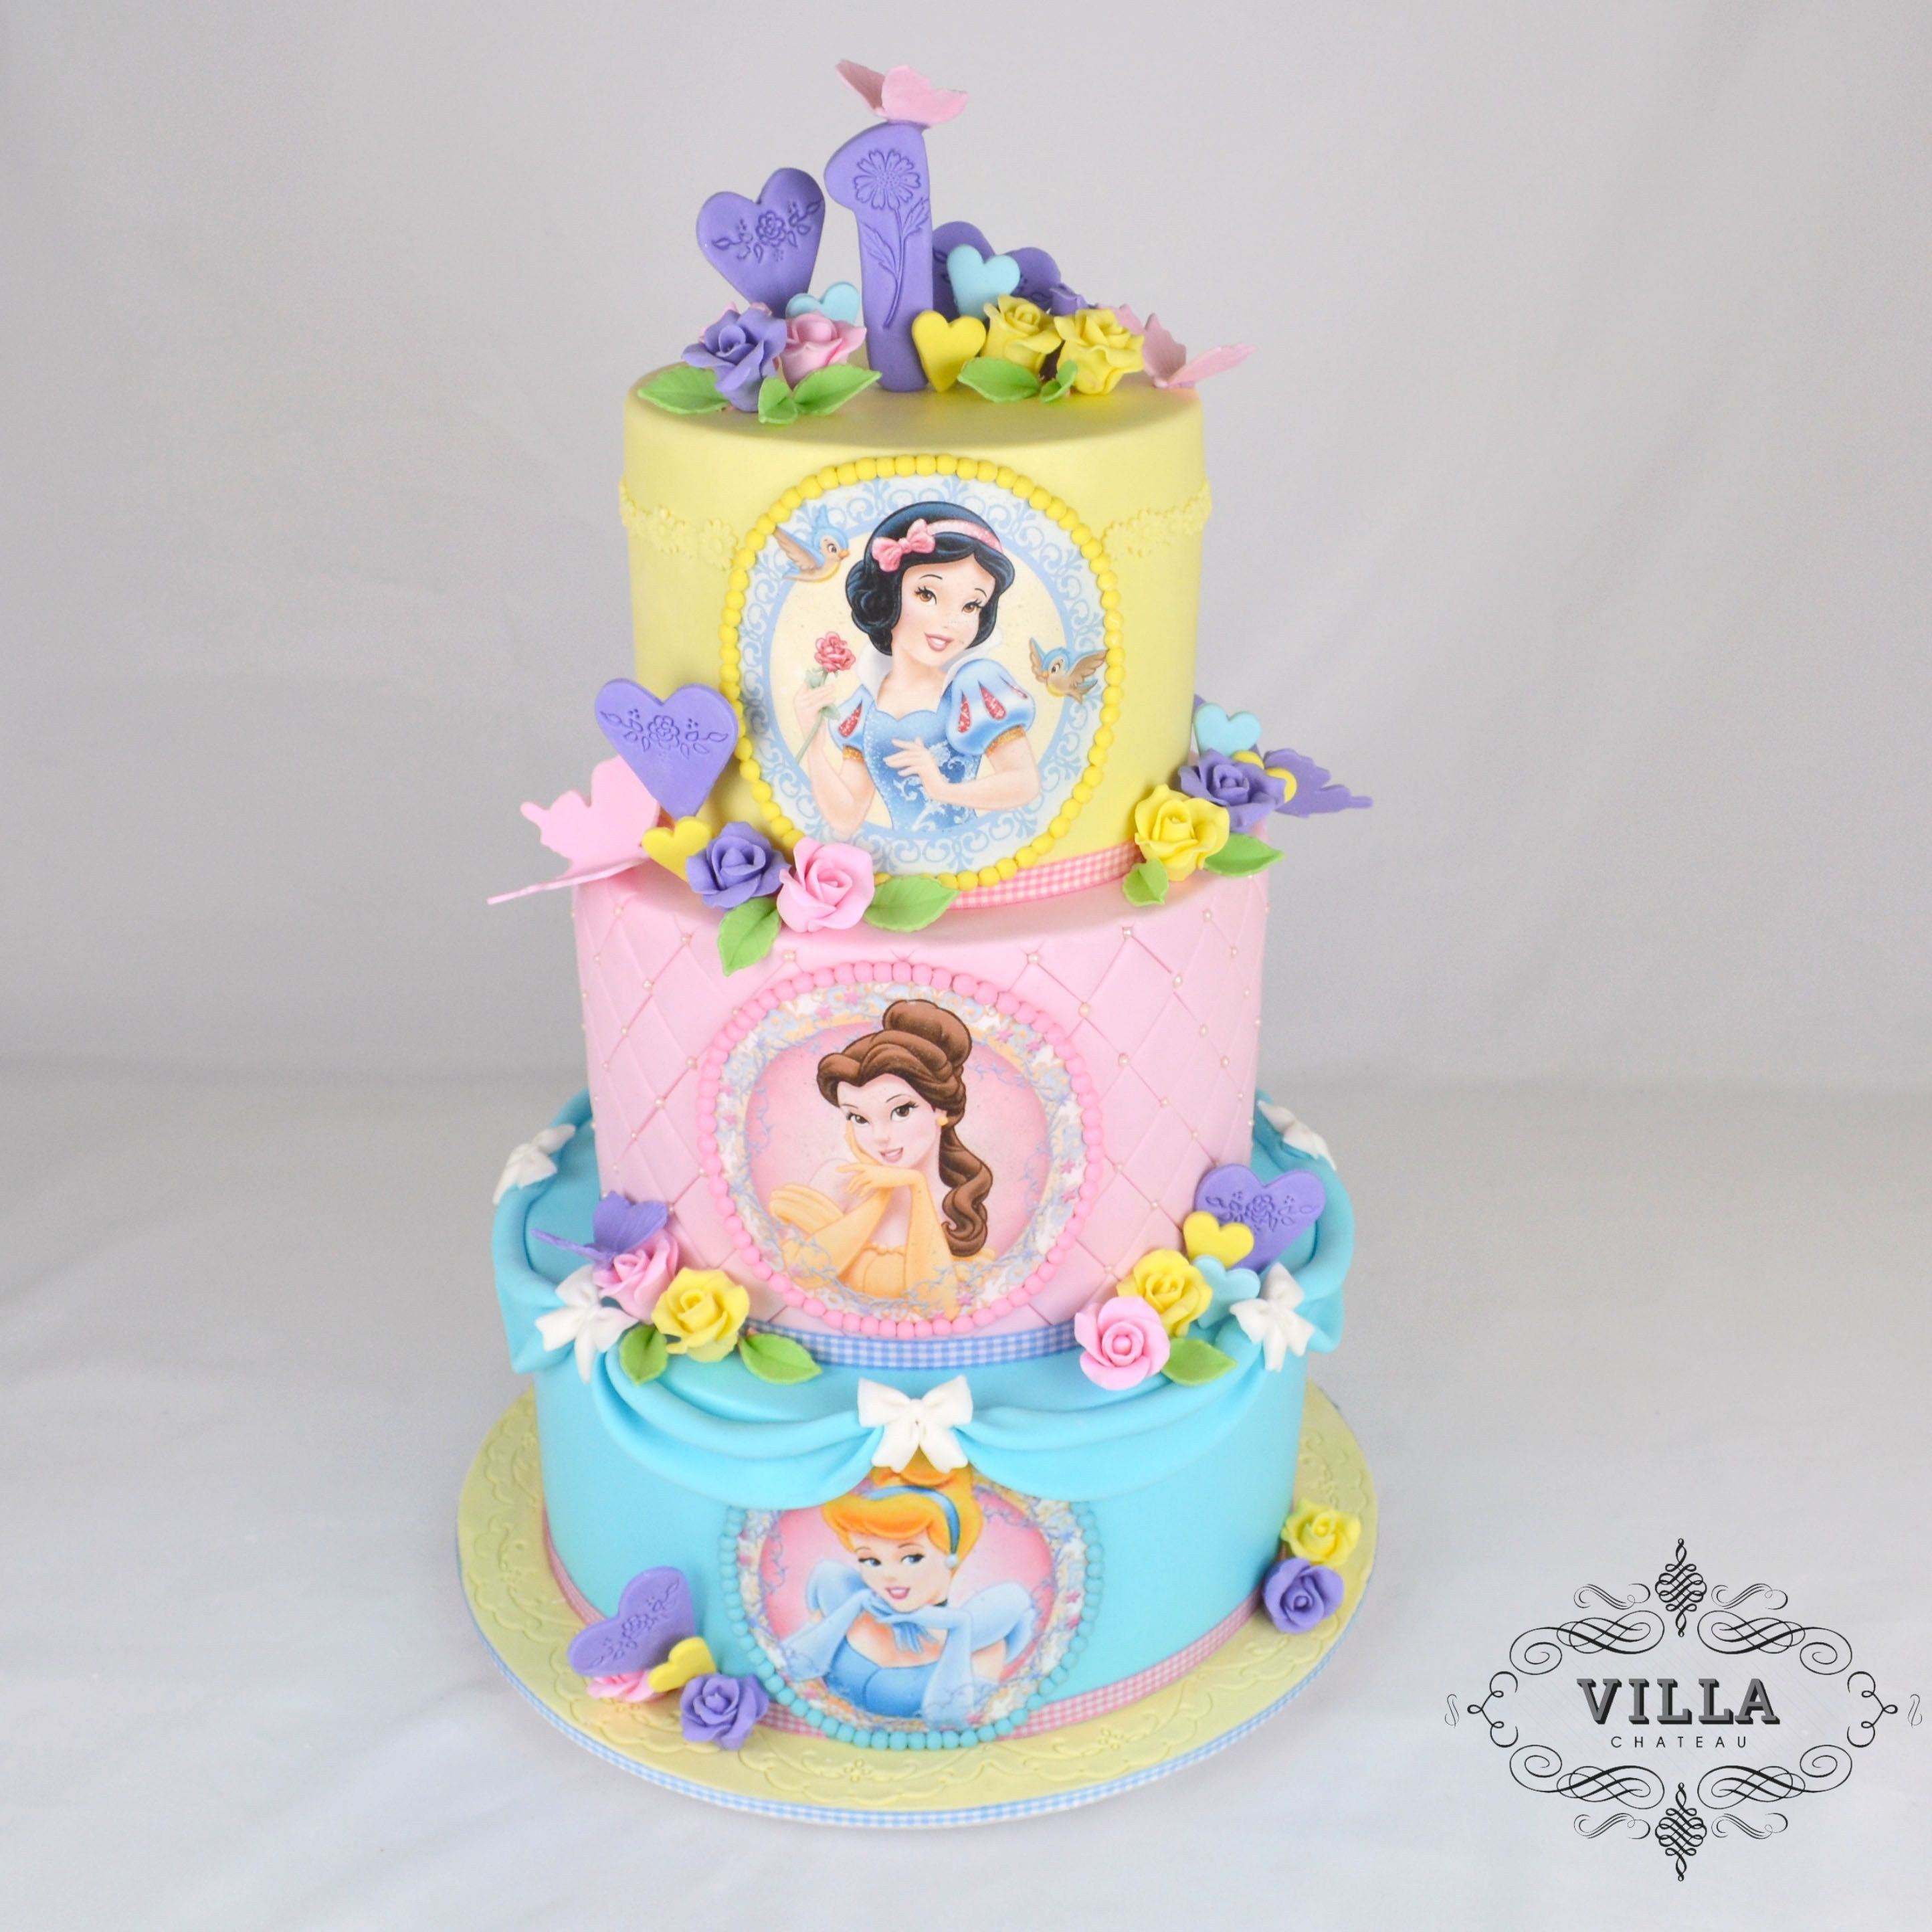 Awesome 27 Exclusive Photo Of Disney Princess Birthday Cakes Disney Funny Birthday Cards Online Elaedamsfinfo